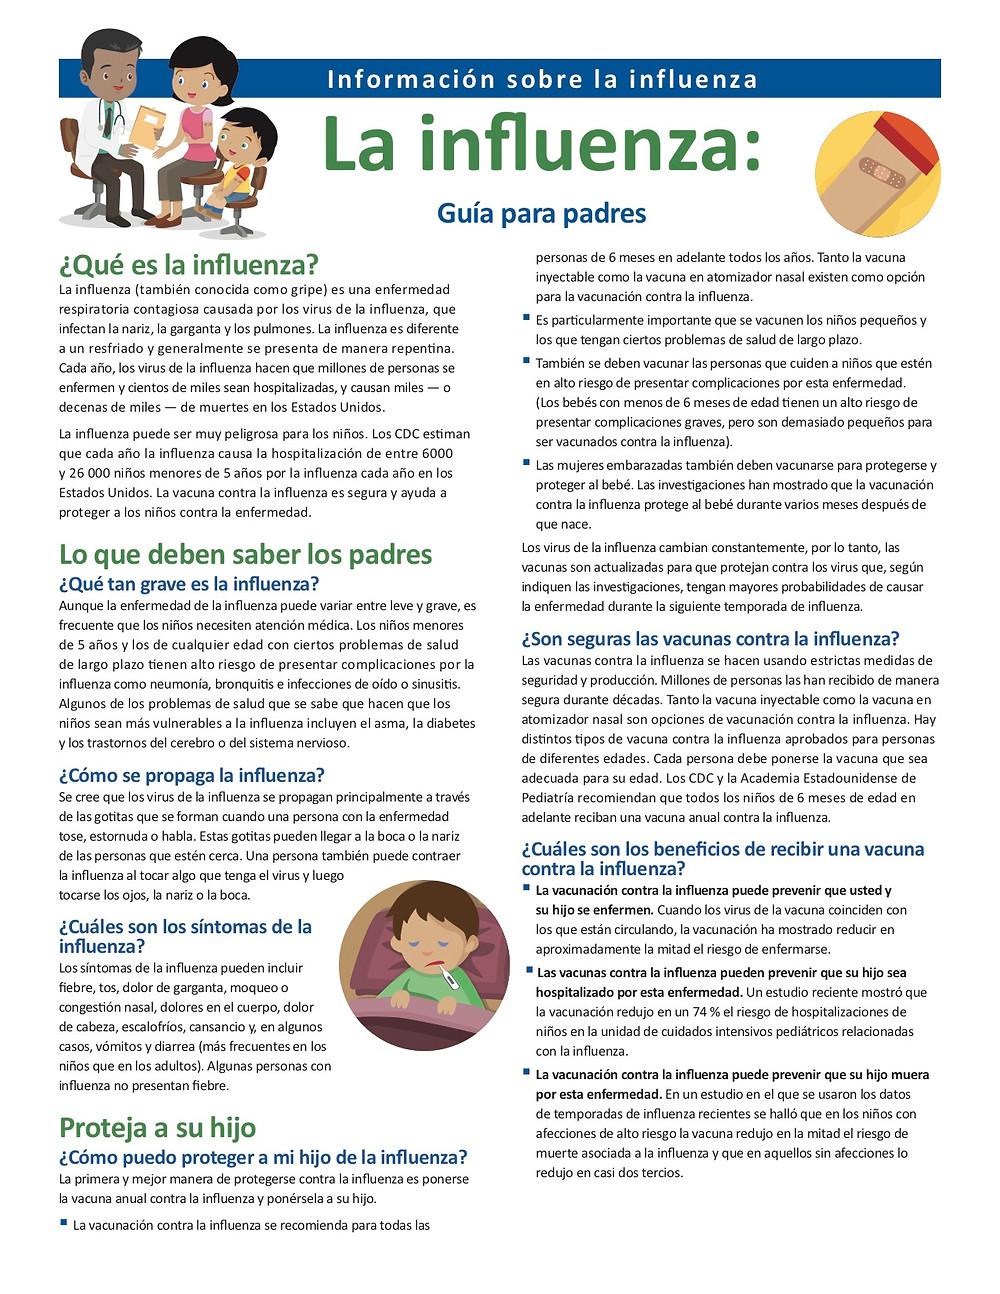 Flu information page 1 en Espanol